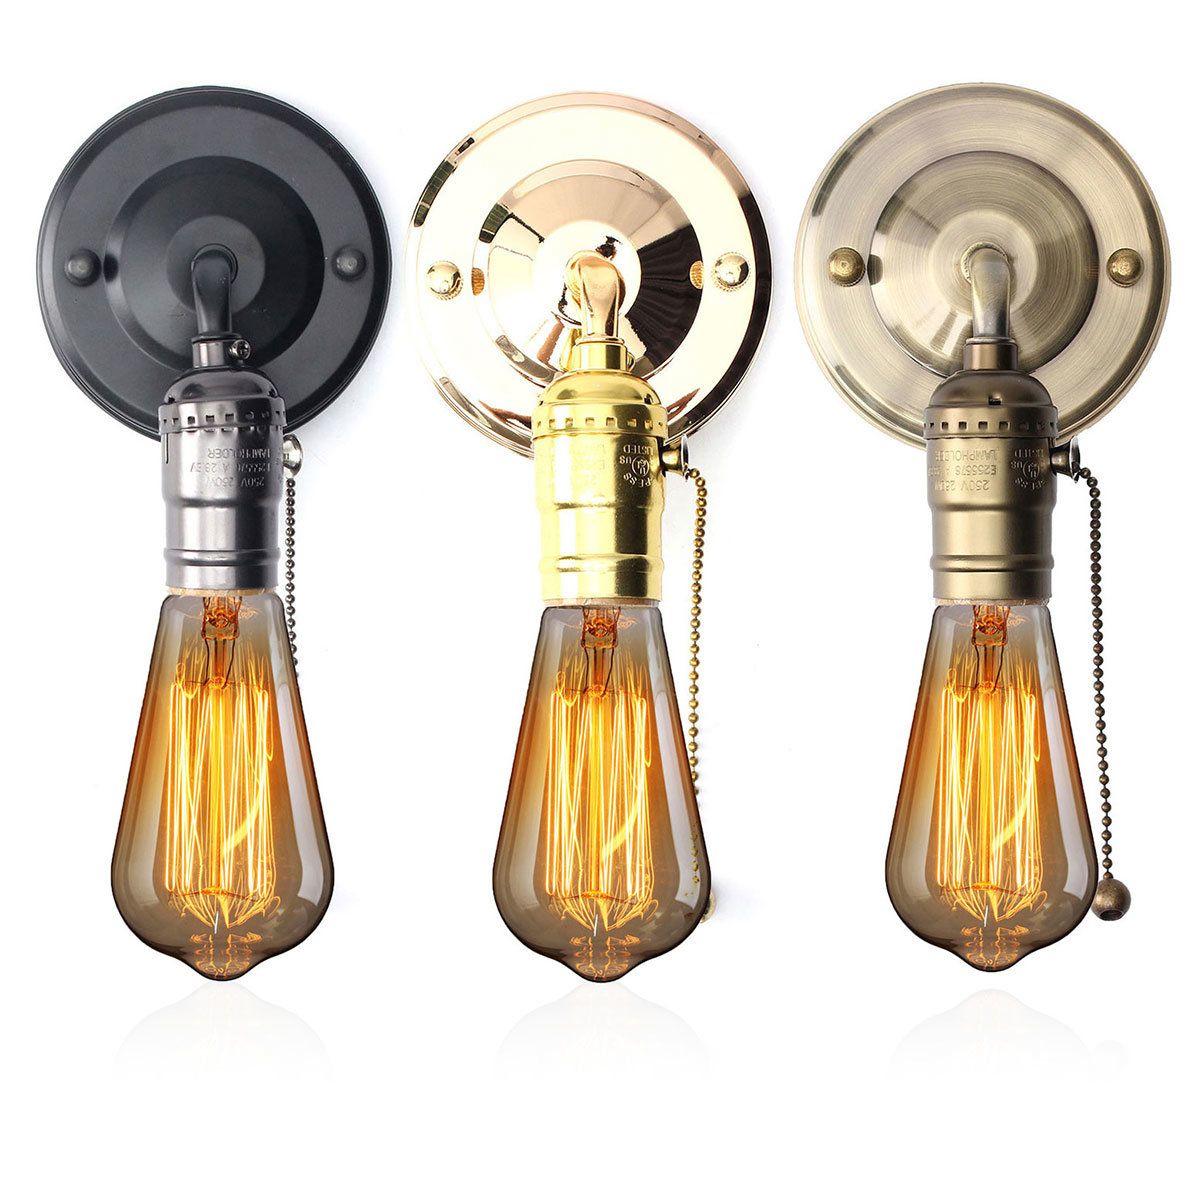 Chain Switched Light Lamp Holder Edison E27 Antique Vintage Rose Gold